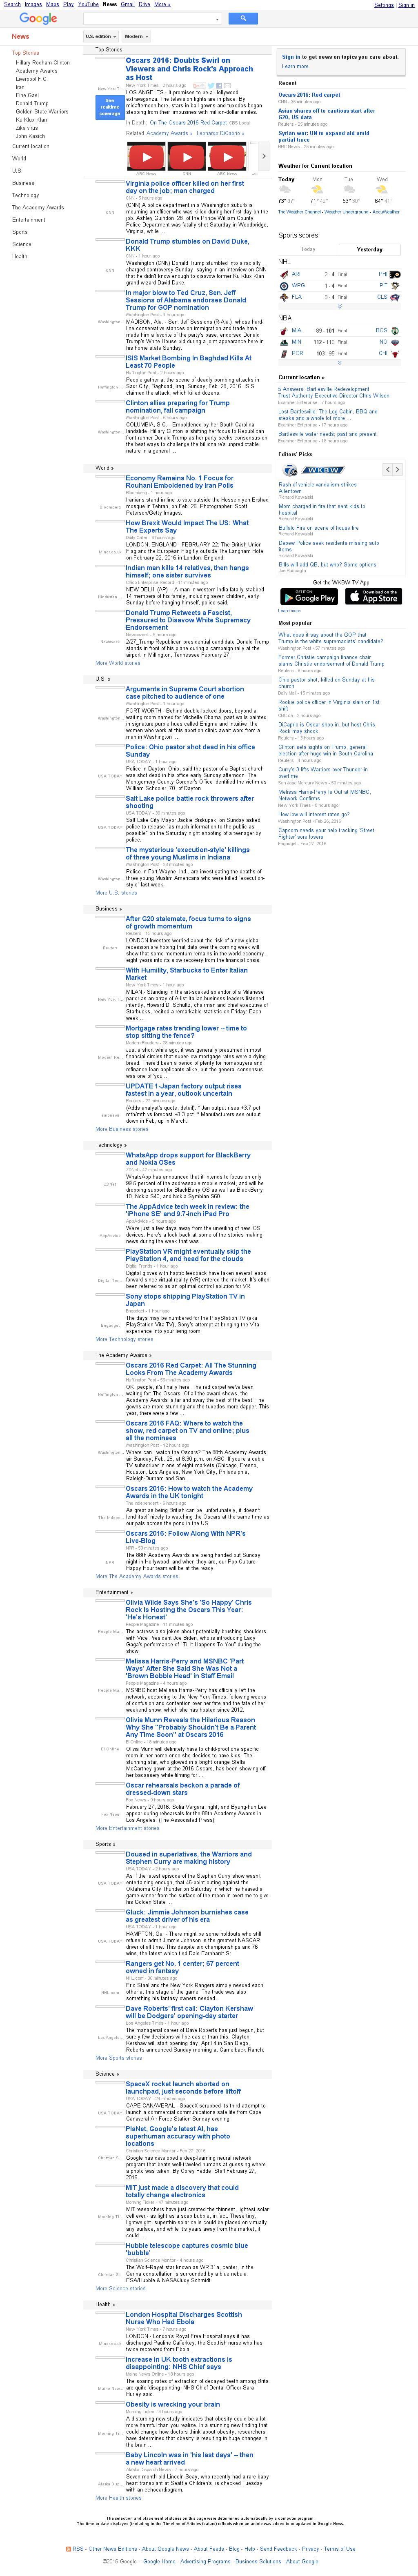 Google News at Monday Feb. 29, 2016, 1:07 a.m. UTC